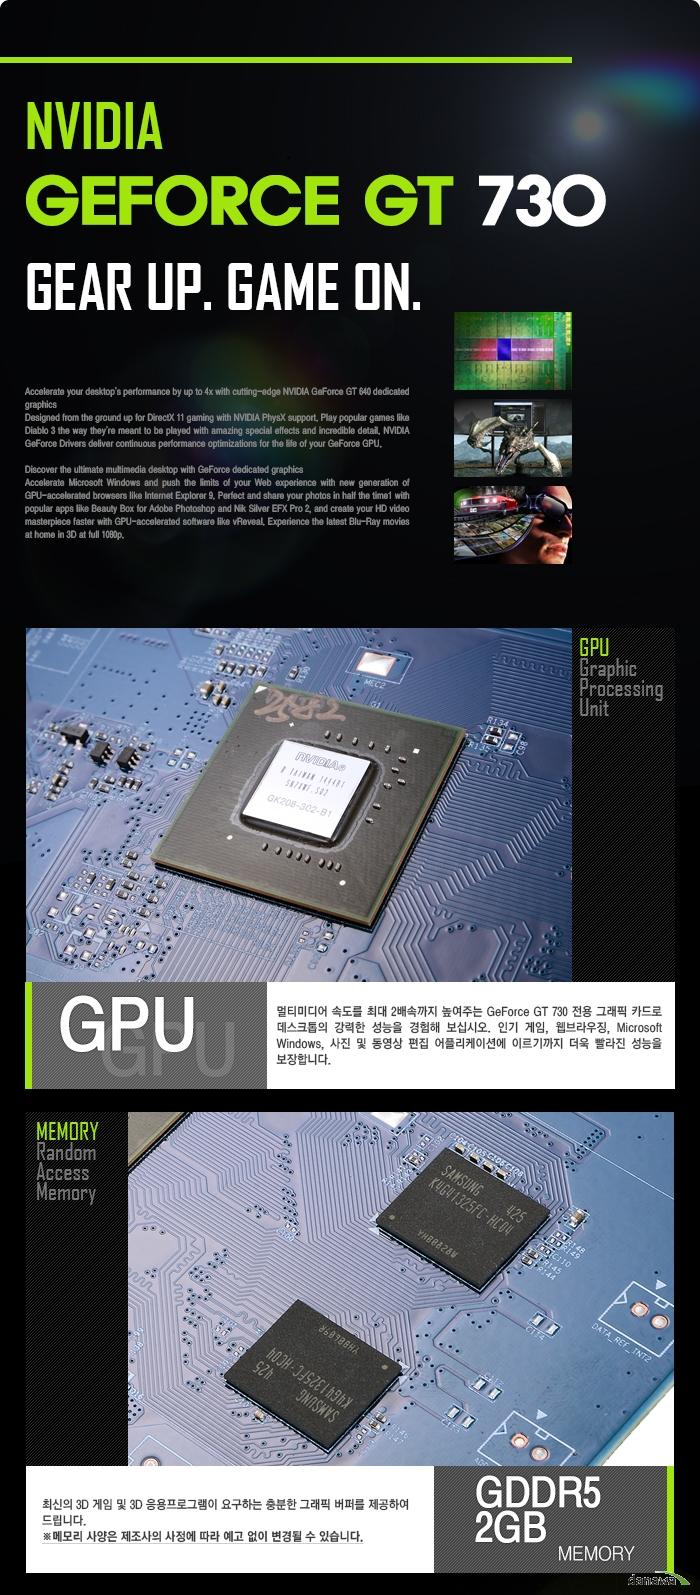 GIGABYTE 지포스 GT730 UD2 D5 2GB 블랙펄 제품 기술설명